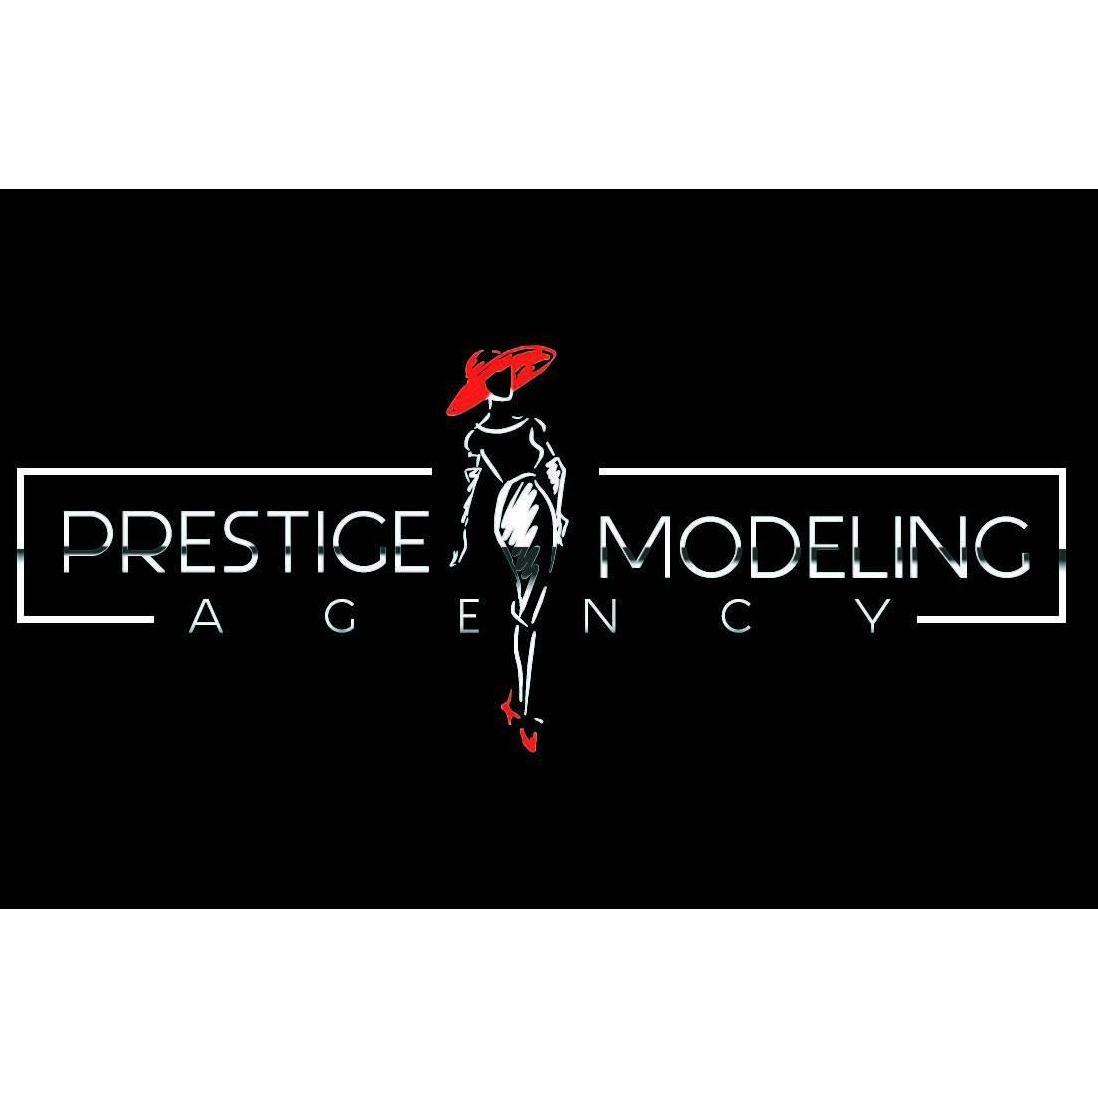 Prestige Model Agency - Henderson, NV 89074 - (702)763-2065 | ShowMeLocal.com